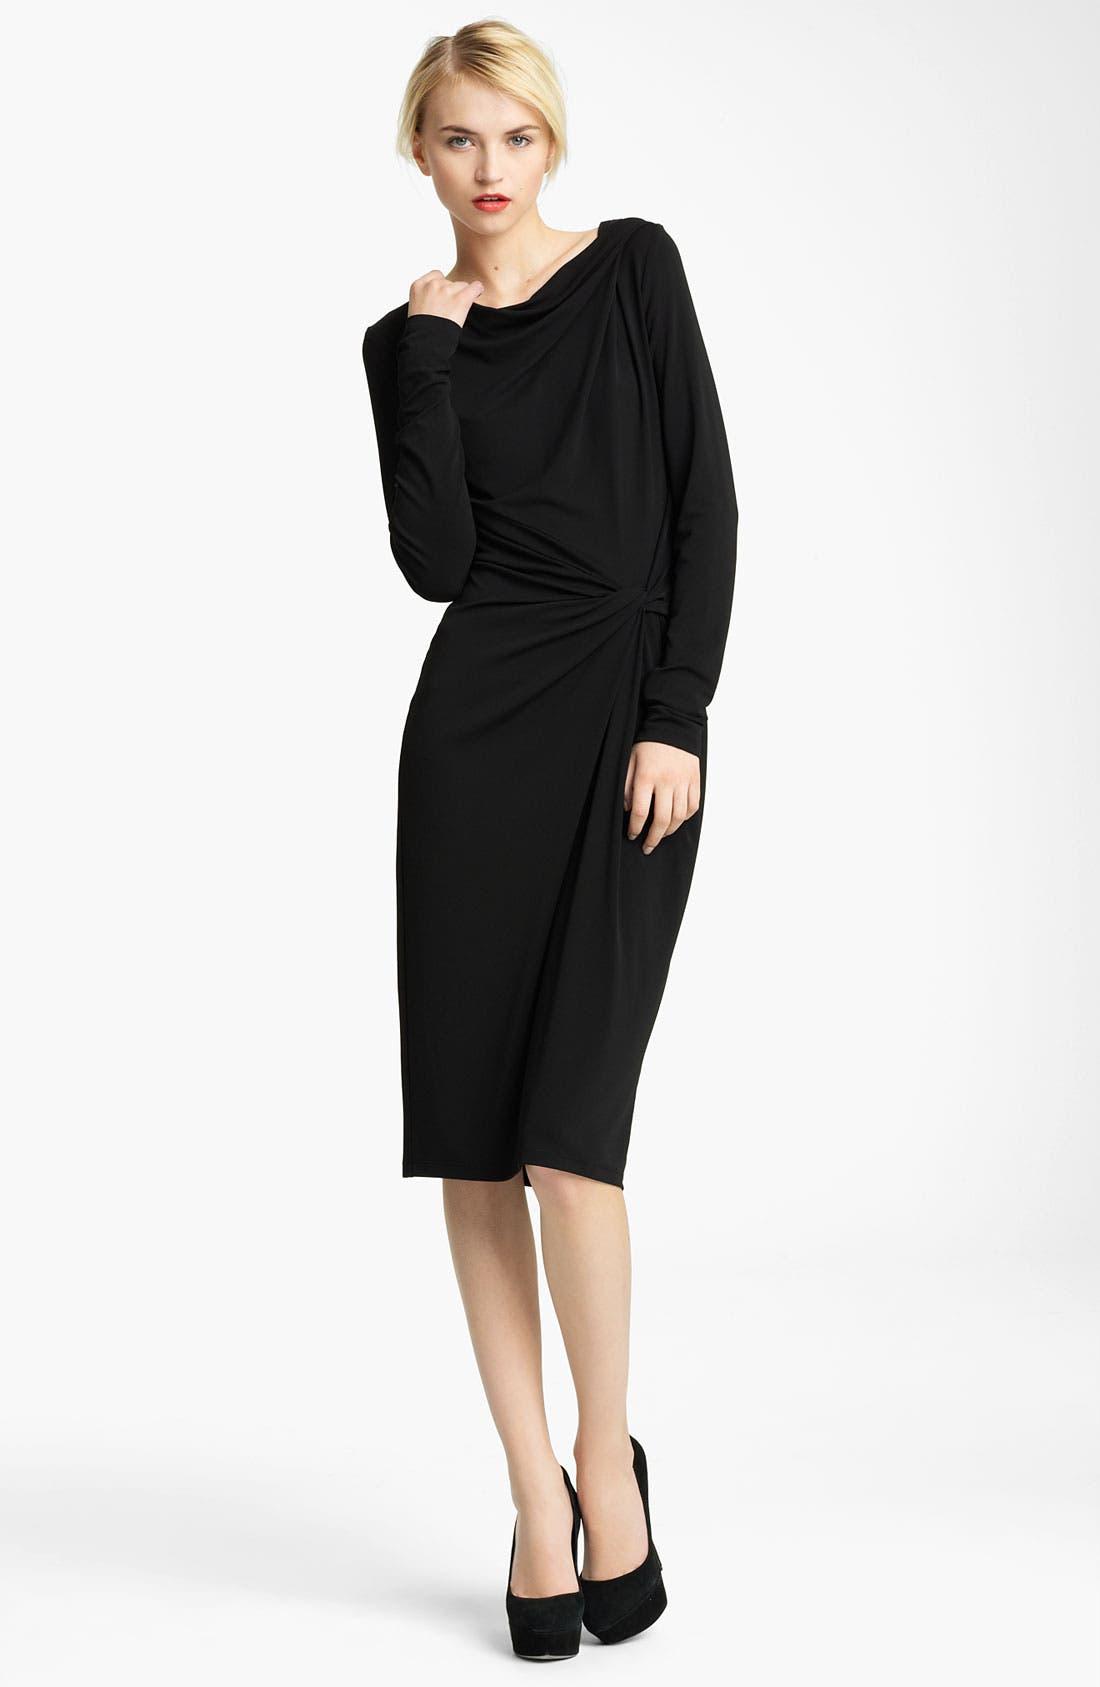 Main Image - Michael Kors Asymmetrical Twist Jersey Dress